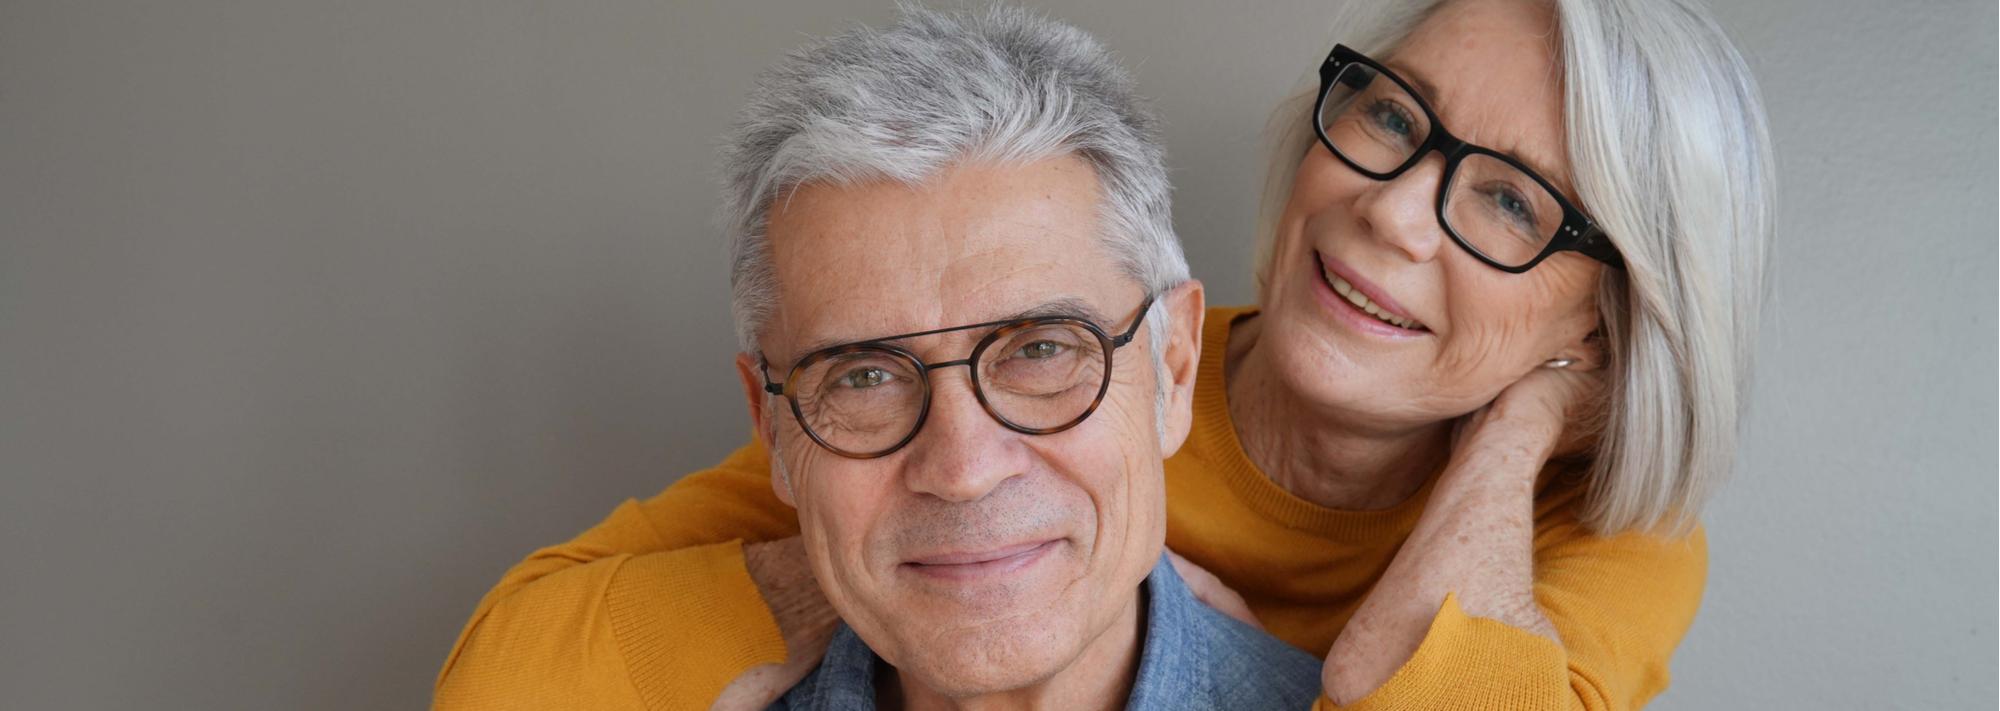 happy couple wearing glasses